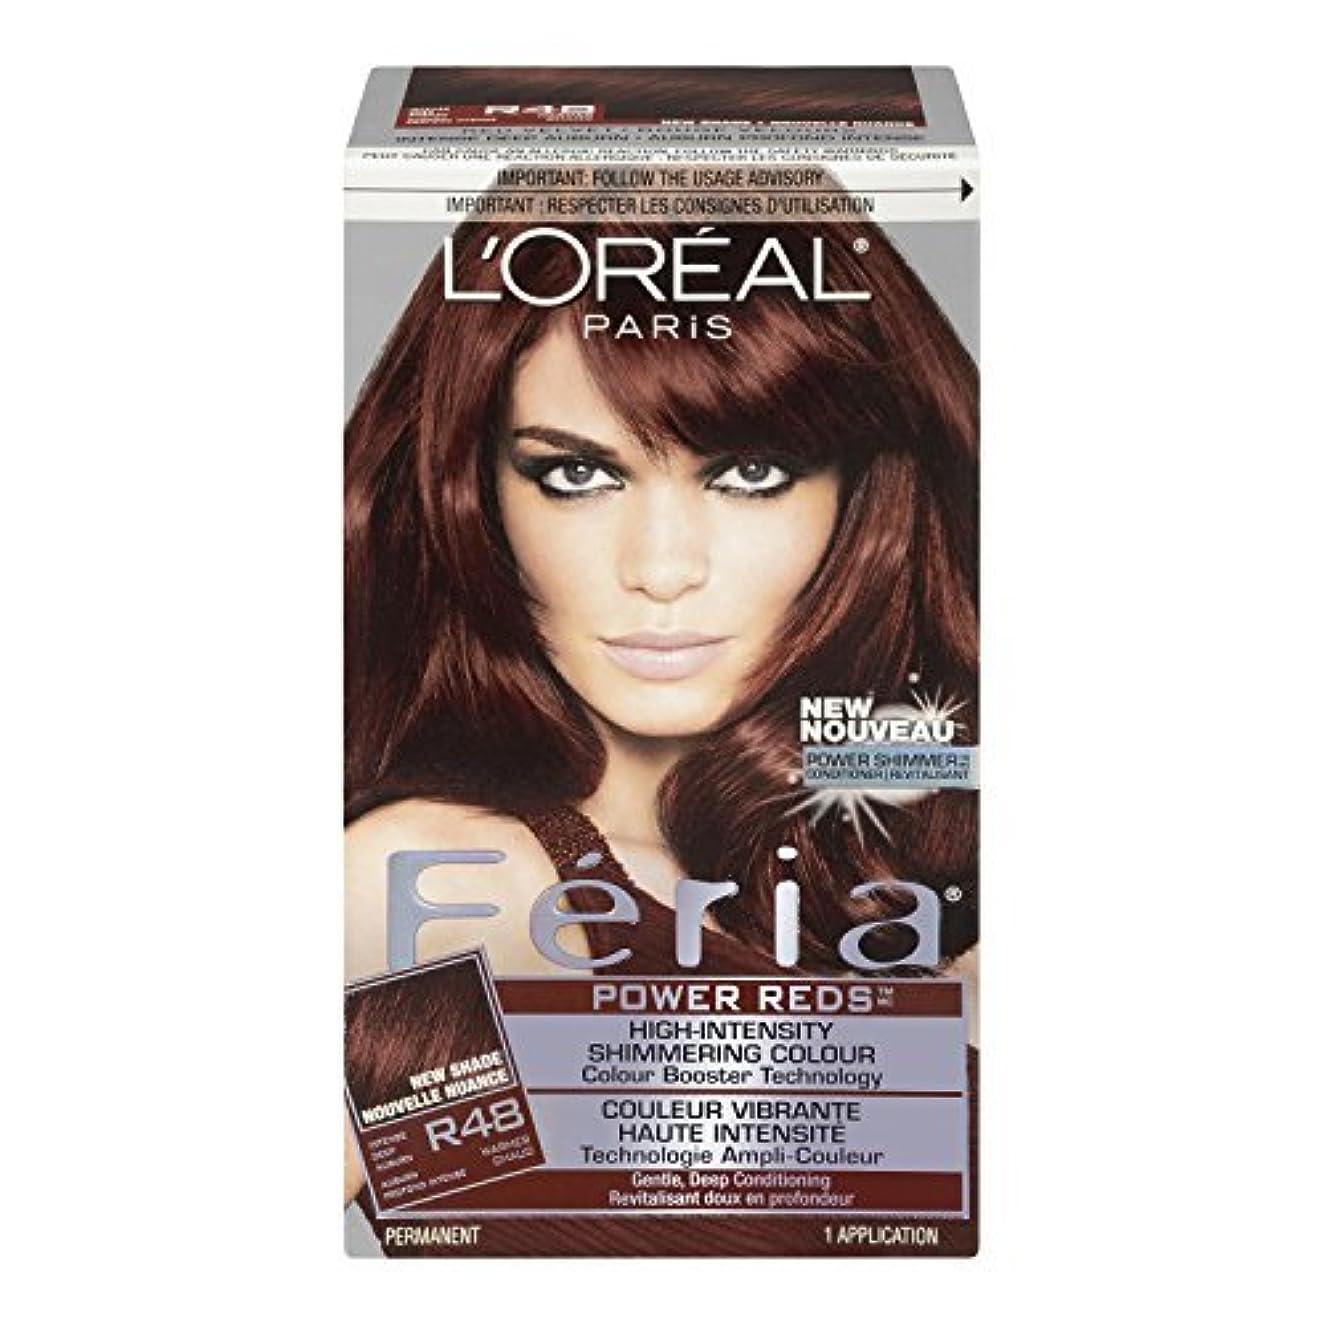 L'Oreal Feria Power Reds Hair Color, R48 Intense Deep Auburn/Red Velvet by L'Oreal Paris Hair Color [並行輸入品]